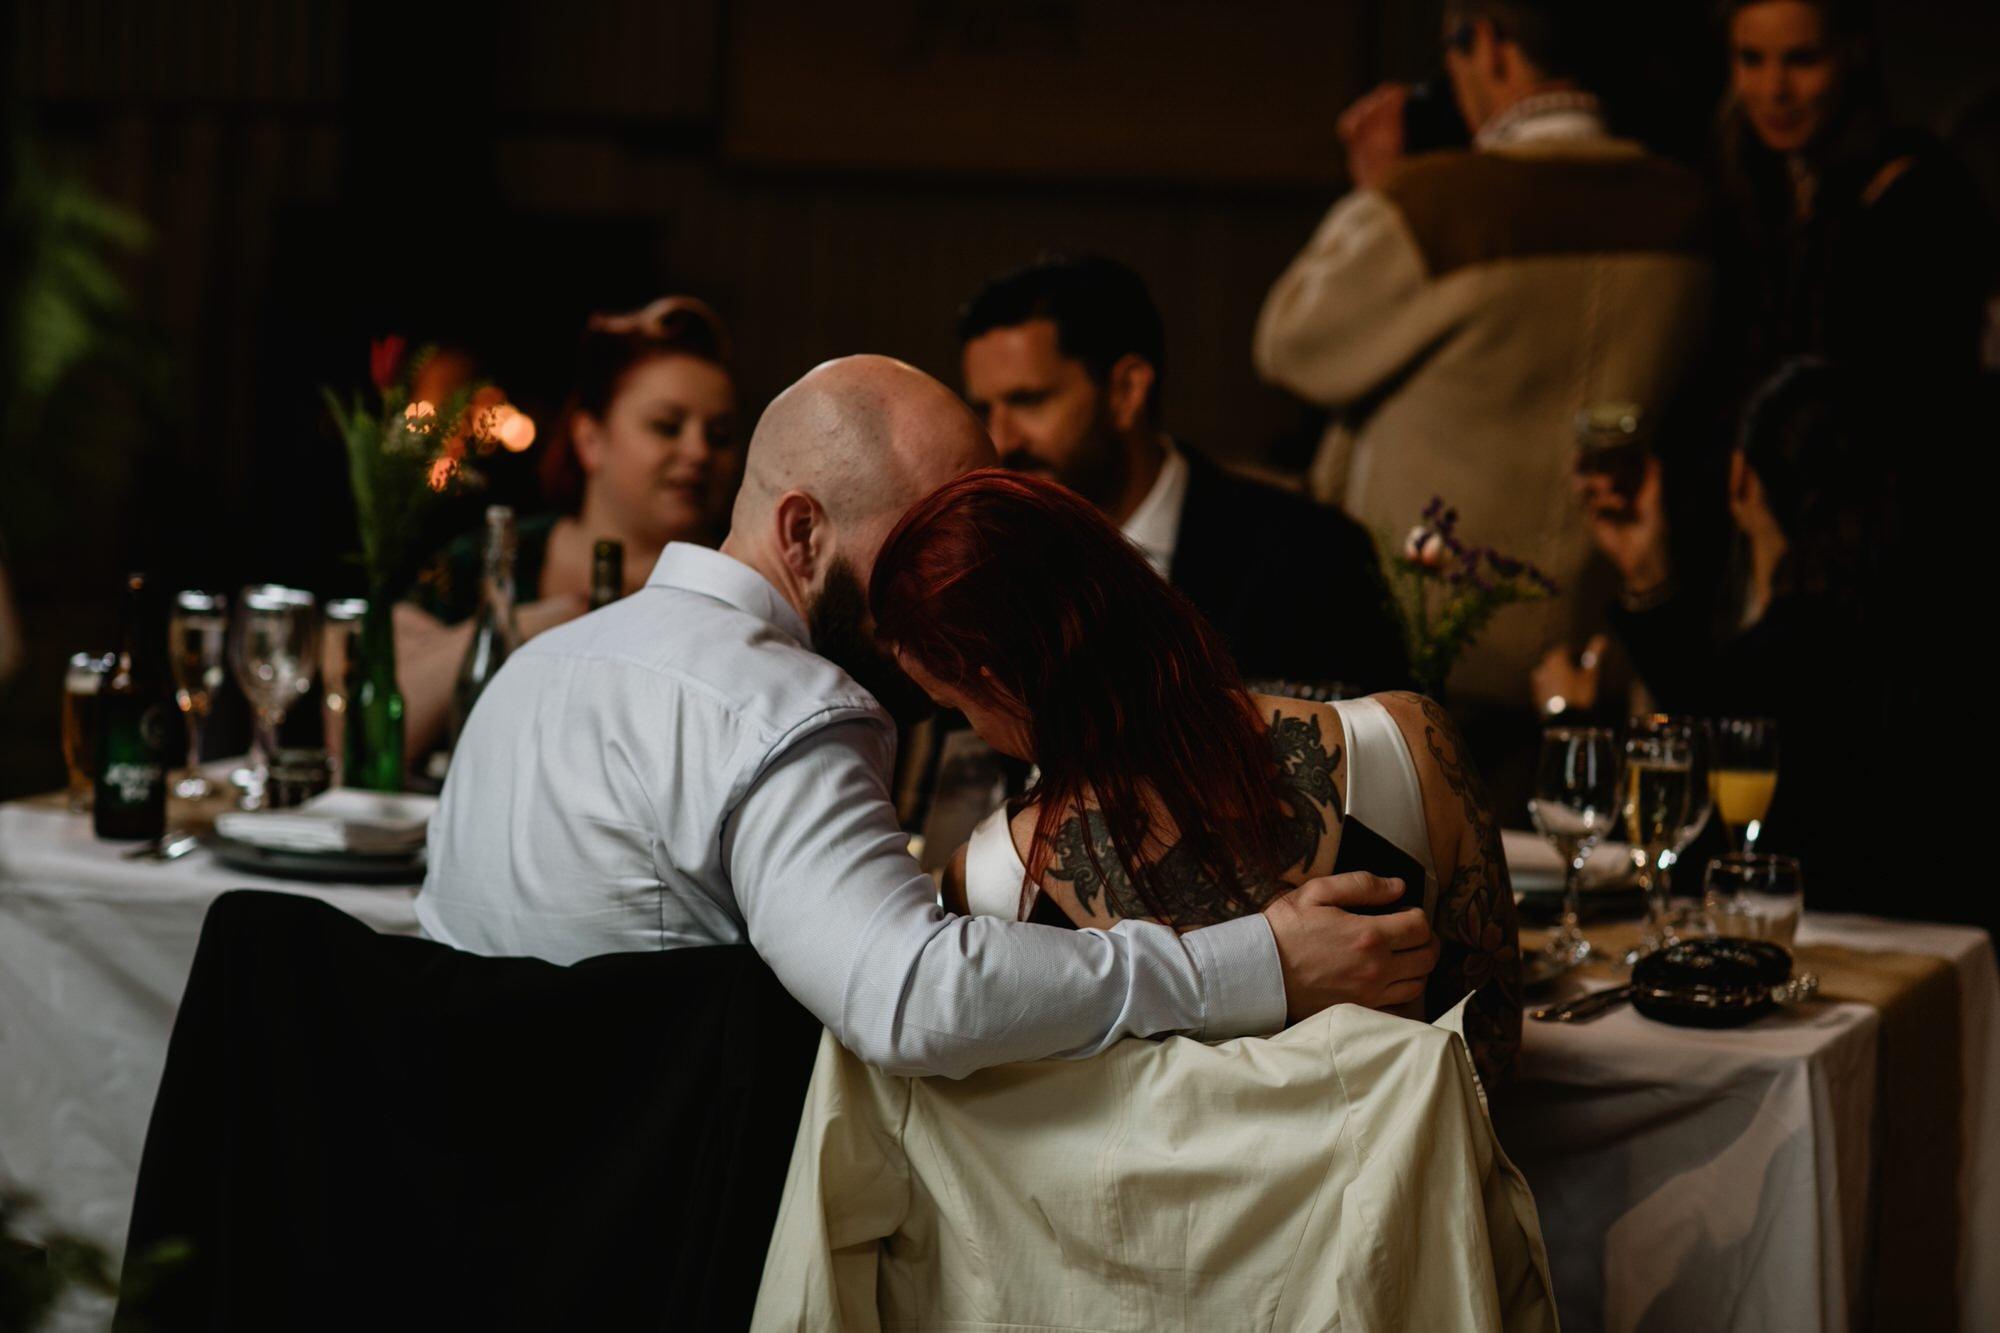 052 TIN SHED KNOCKRAICH WEDDING AUSTRIAN SCOTTISH ZOE ALEXANDRA PHOTOGRAPHY